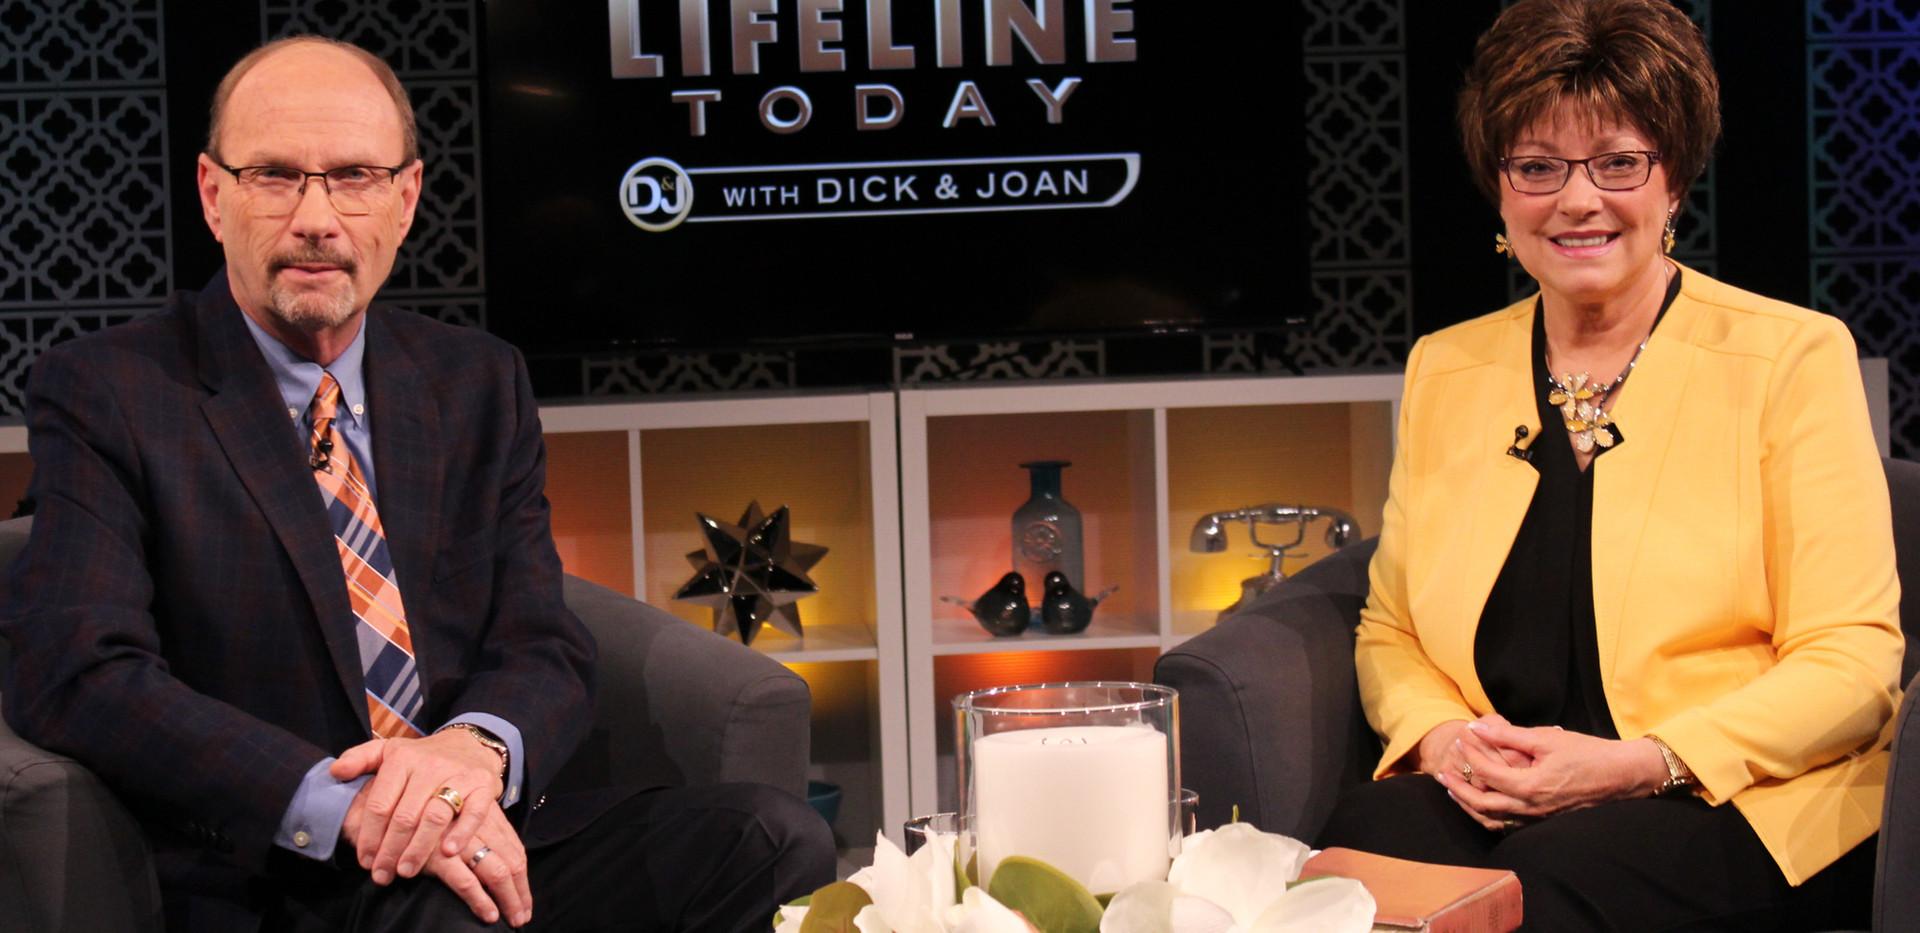 LIFELINE TODAY | Season 6, Episode 200 | Easter Program 2020